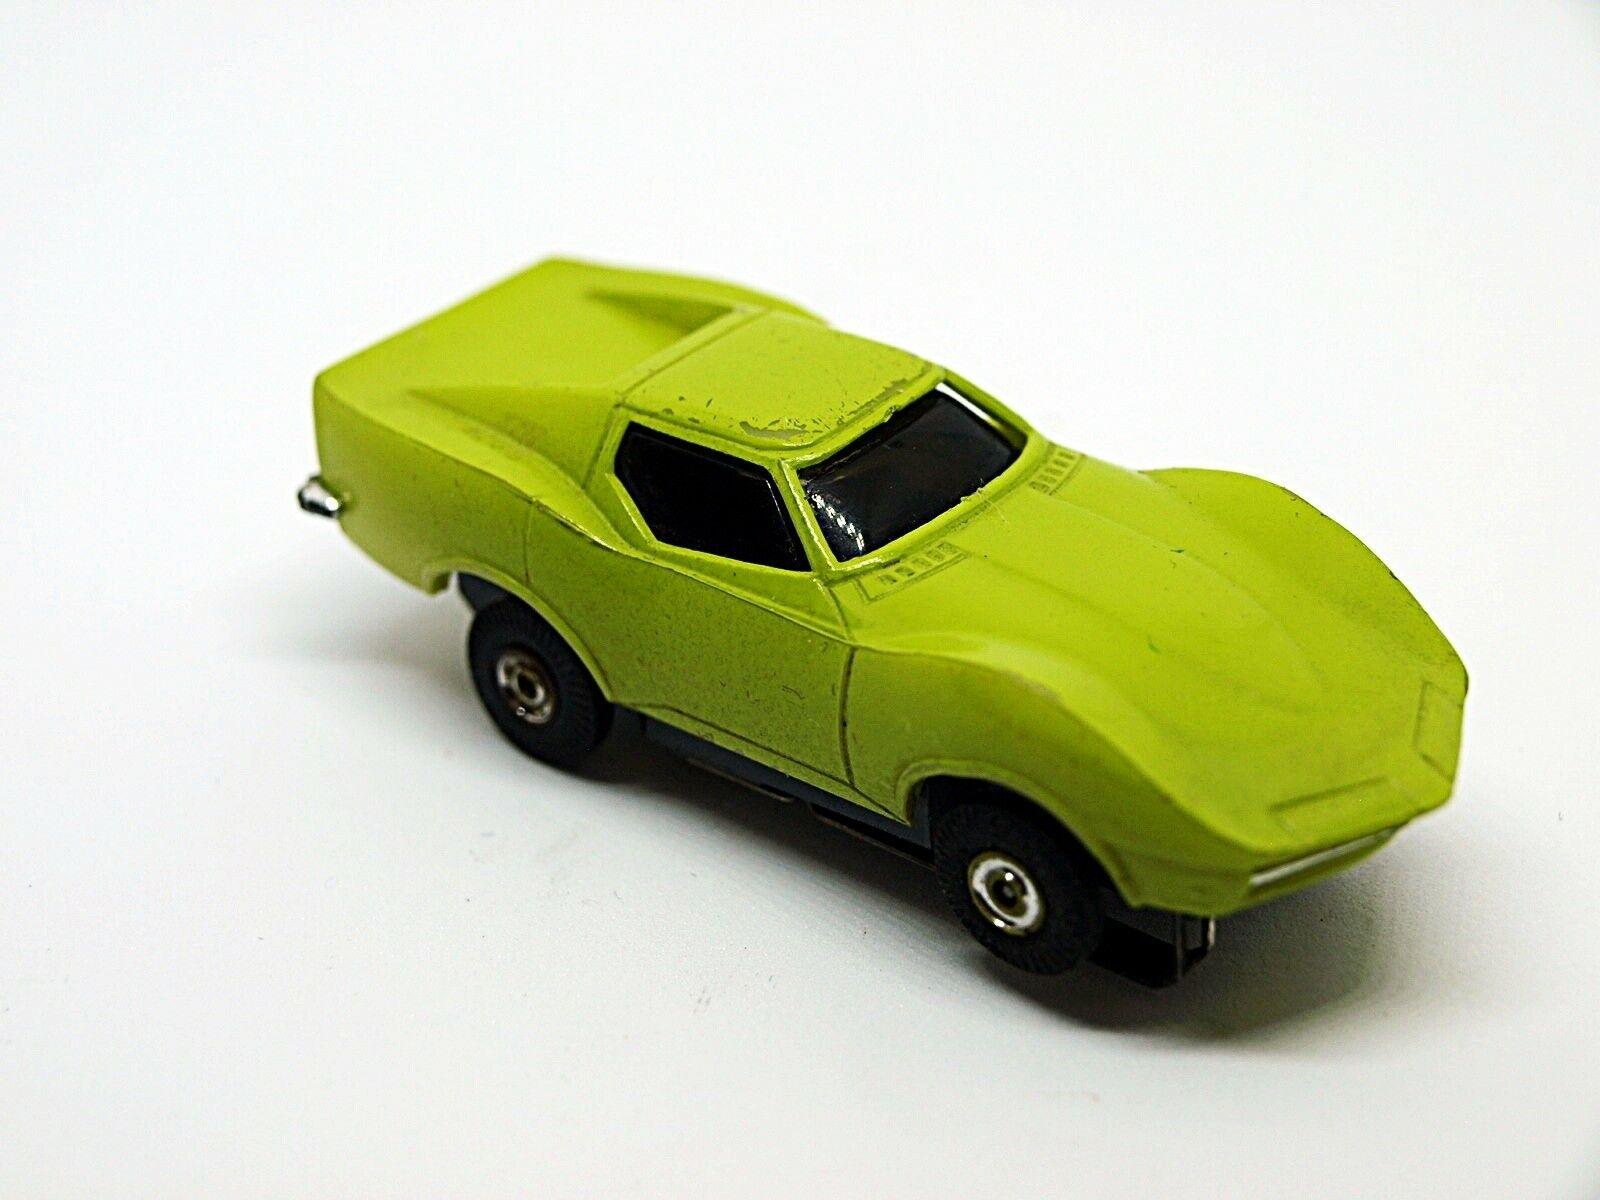 Eldon ho slot car Lime Mako Shark CORVETTE Nice Rare Aurora